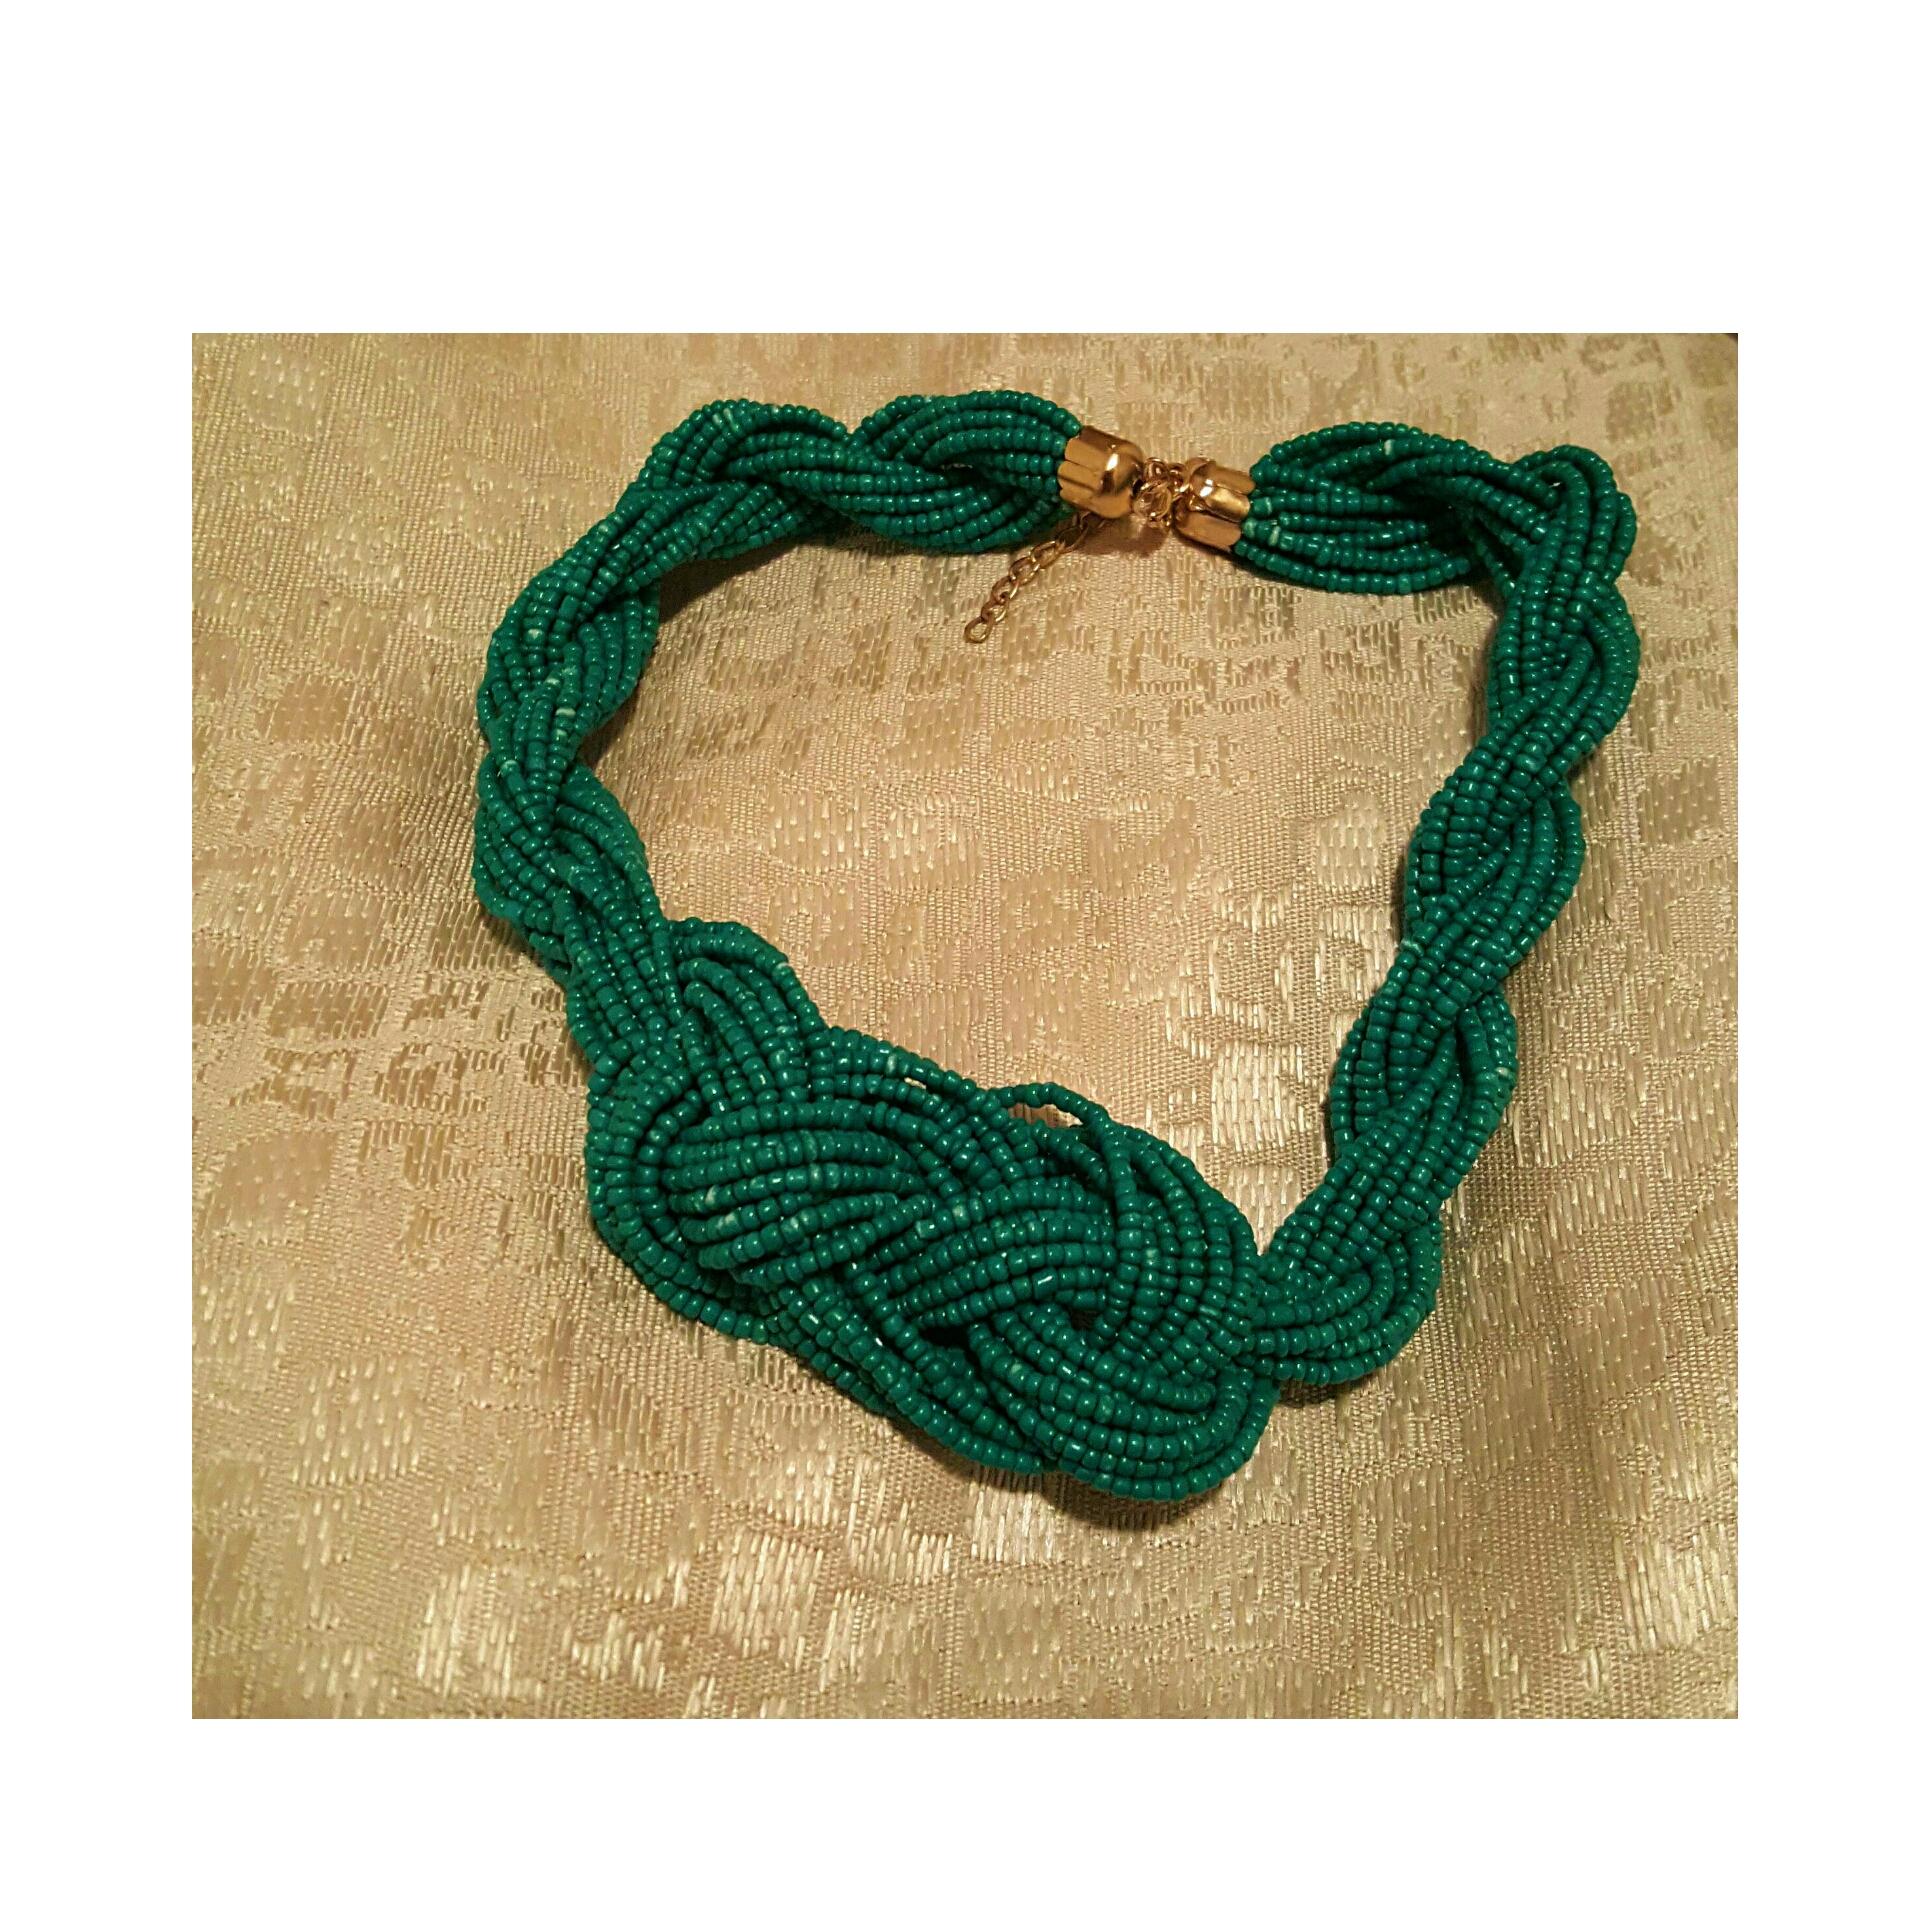 Beaded Necklace - Kenya